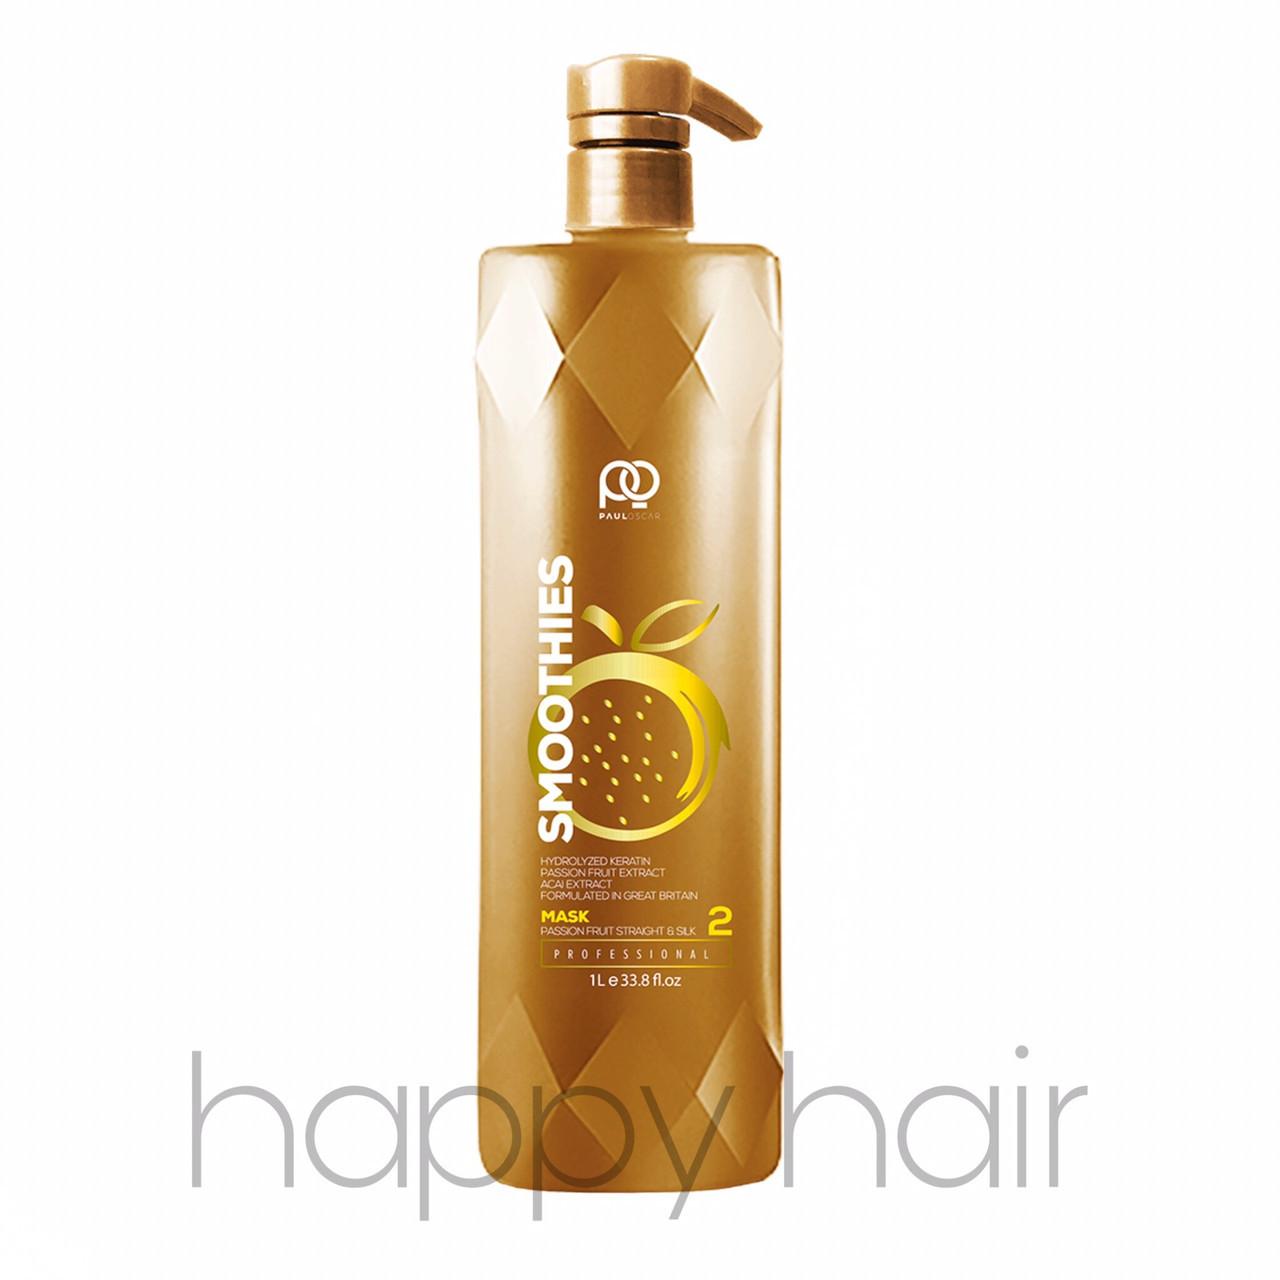 Paul Oscar Smoothies Passion Fruit Smooth & Silky Кератин для волос 500 мл